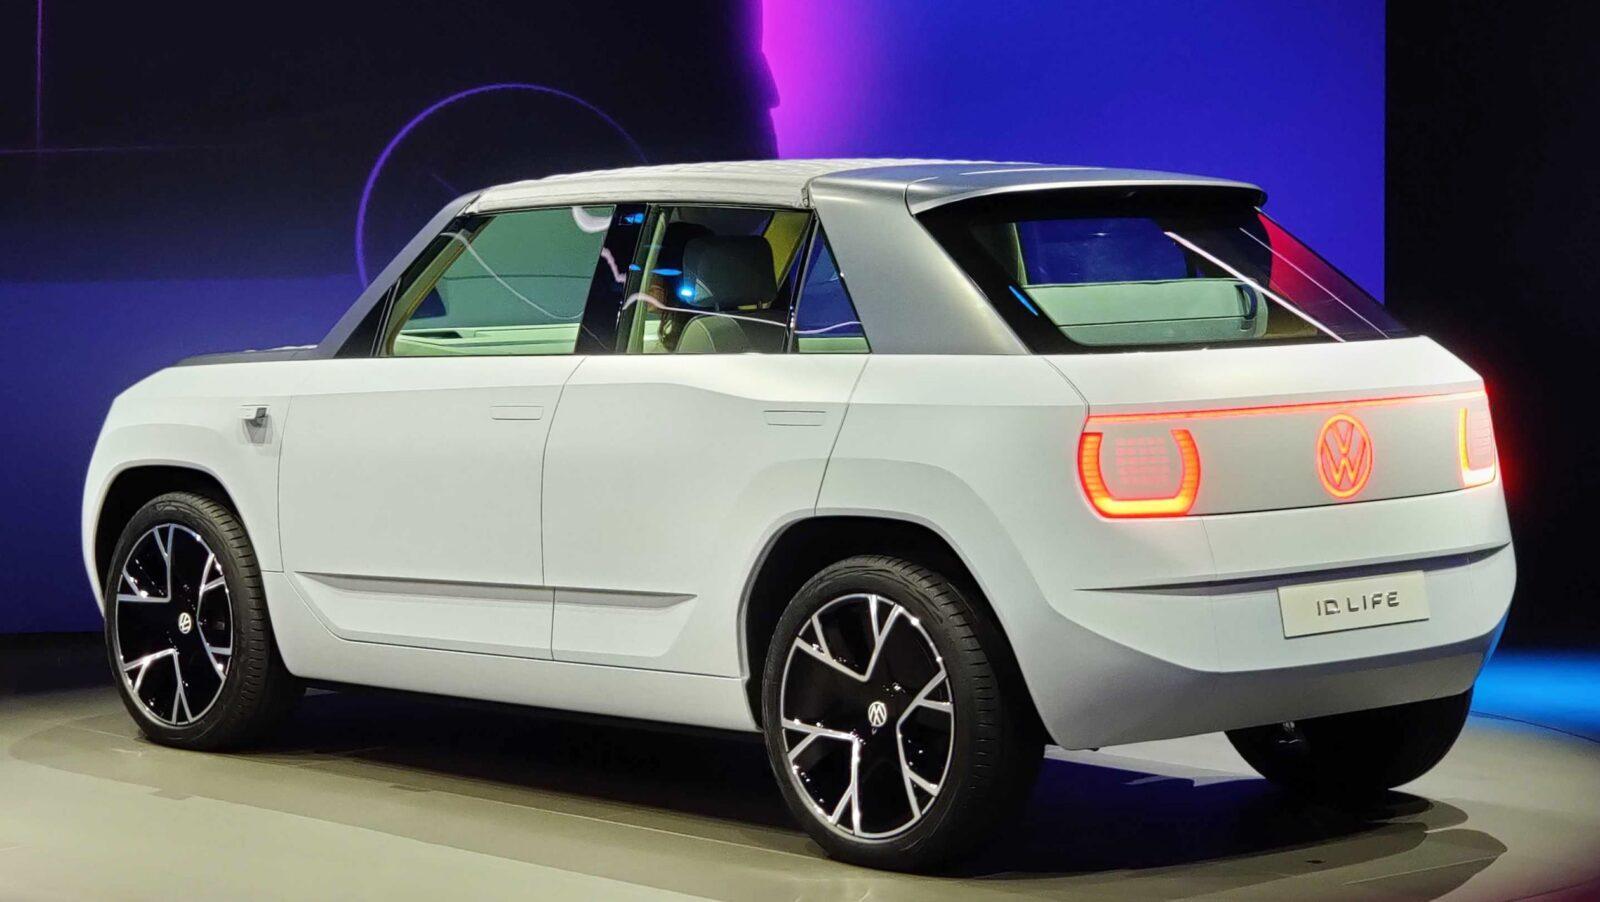 Volkswagen представил новый концепт-кар ID.Life на IAA MOBILITY 2021 в Мюнхене (volkswagen id life munich 6)